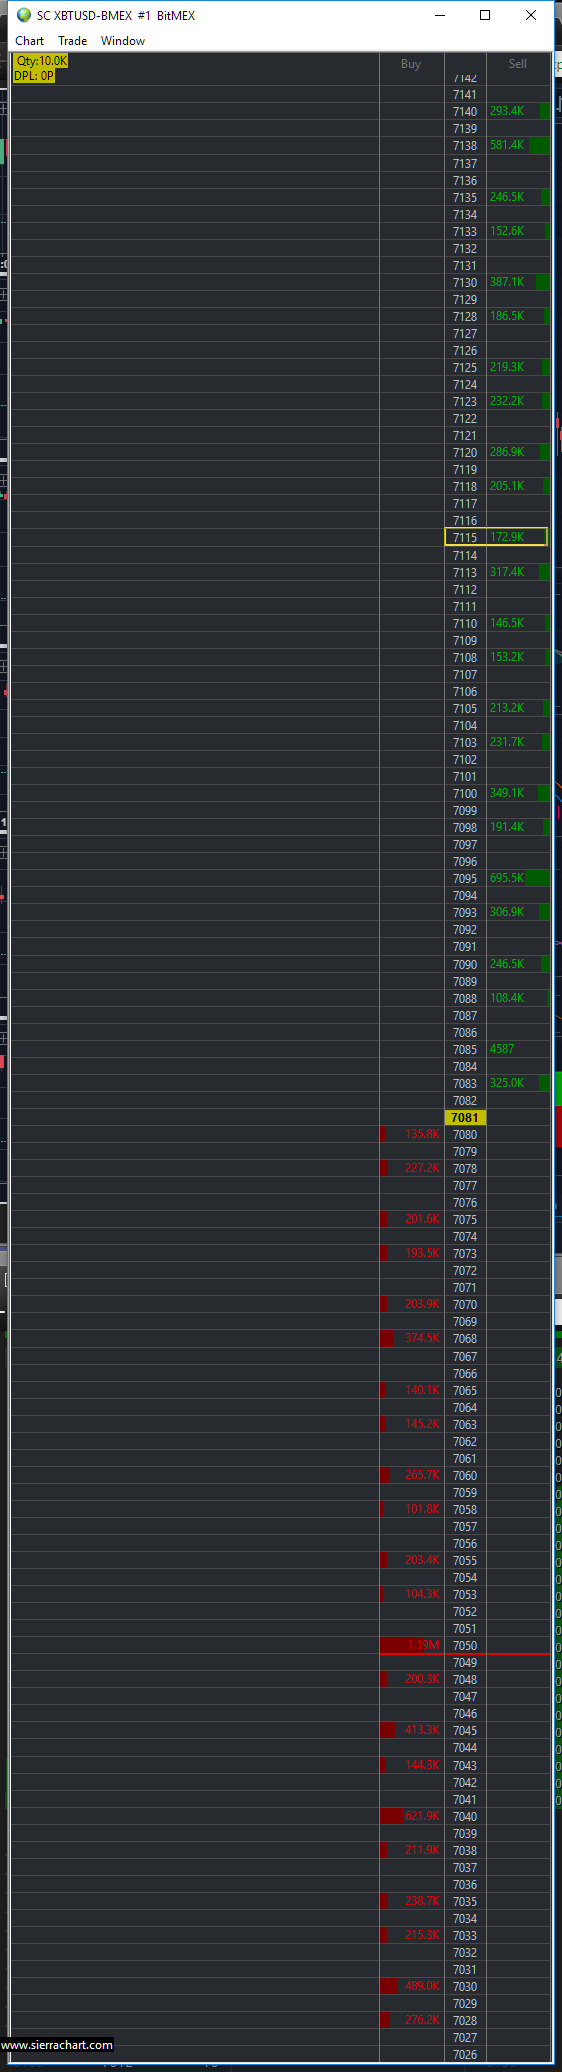 Bitmex group orderbook depth - Support Board - Sierra Chart